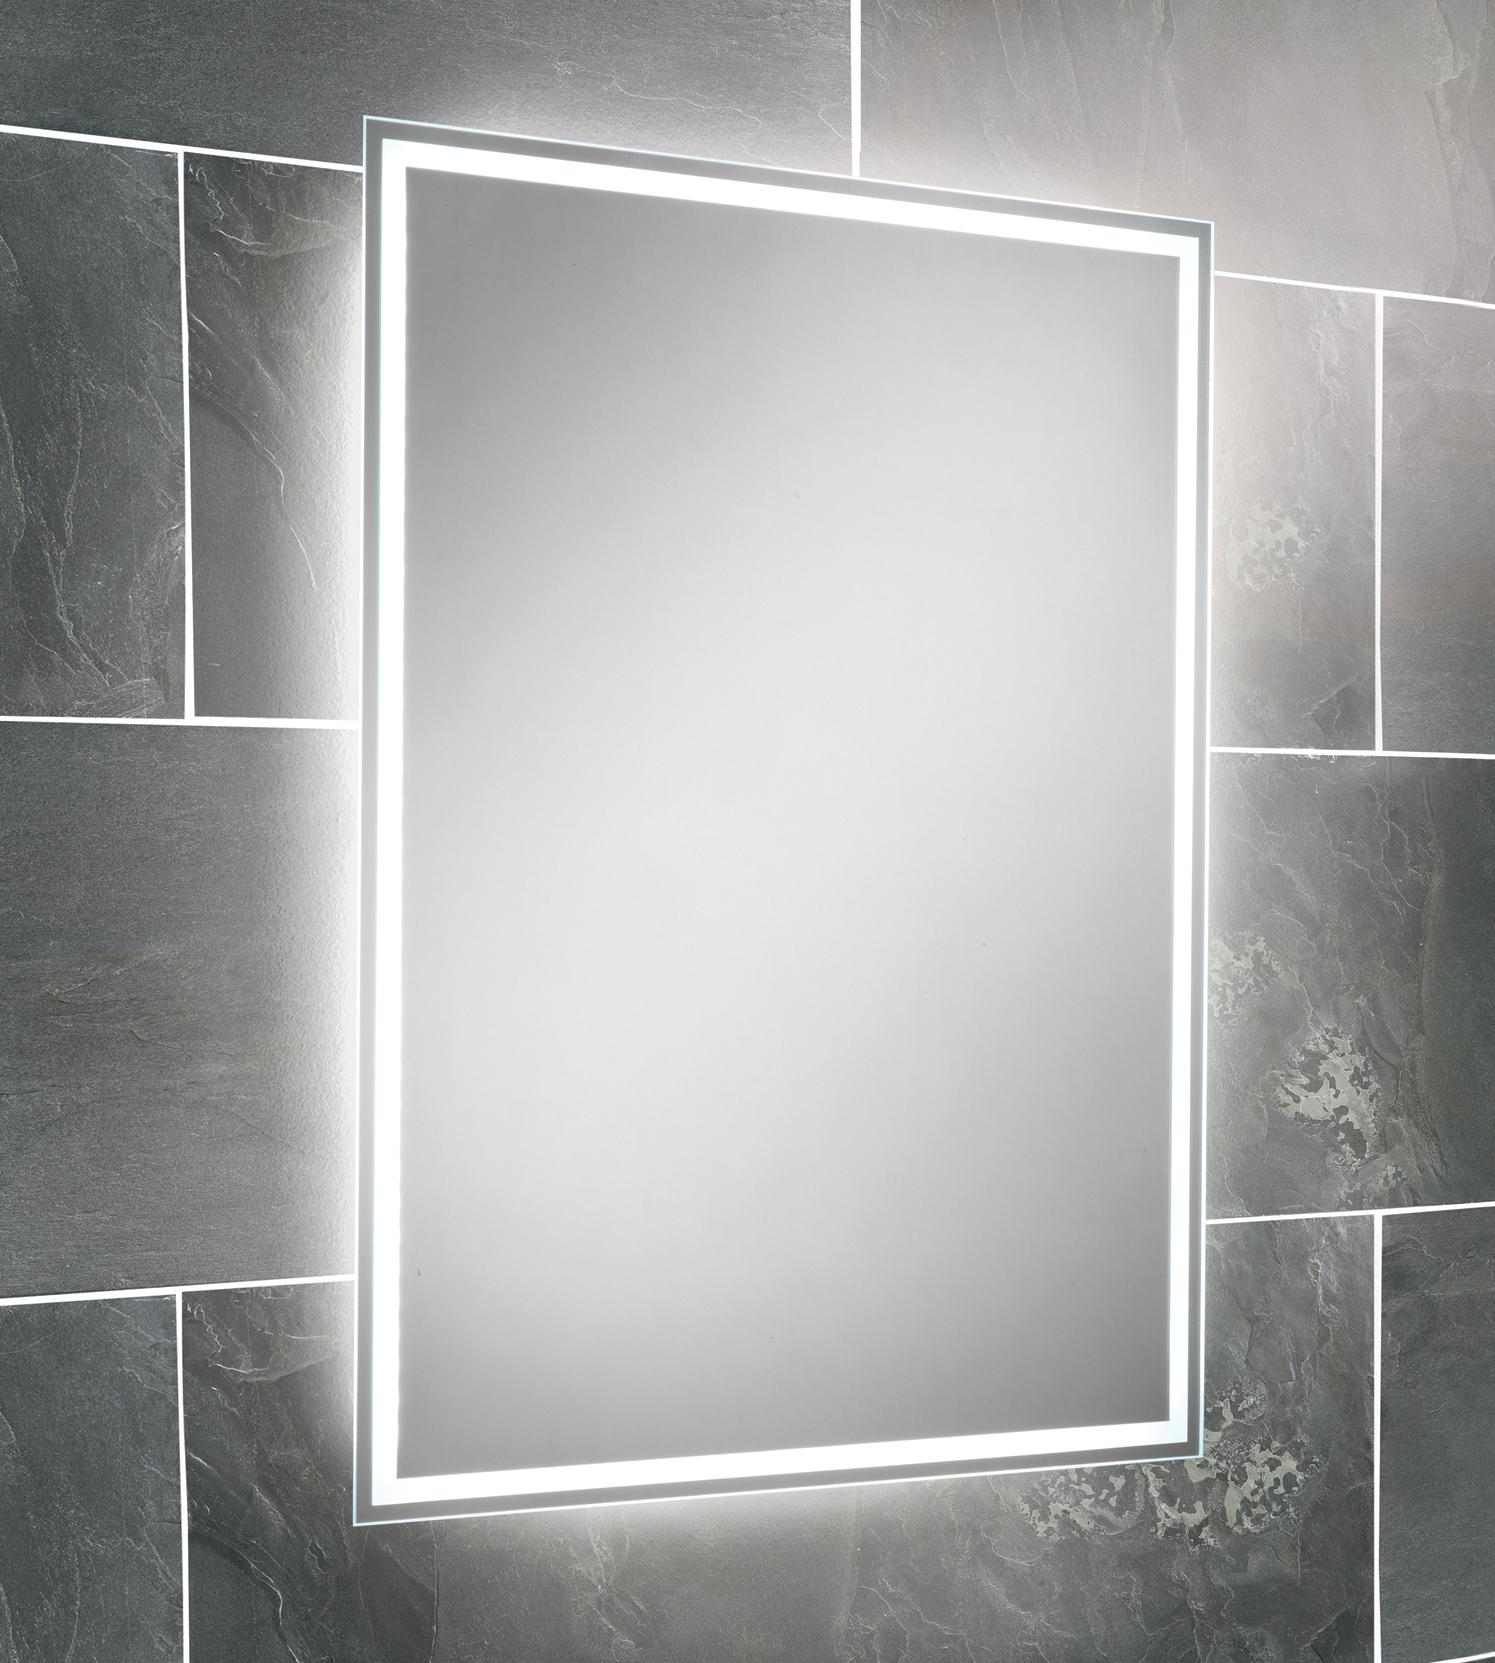 Luxury Illuminated Bathroom Mirrors